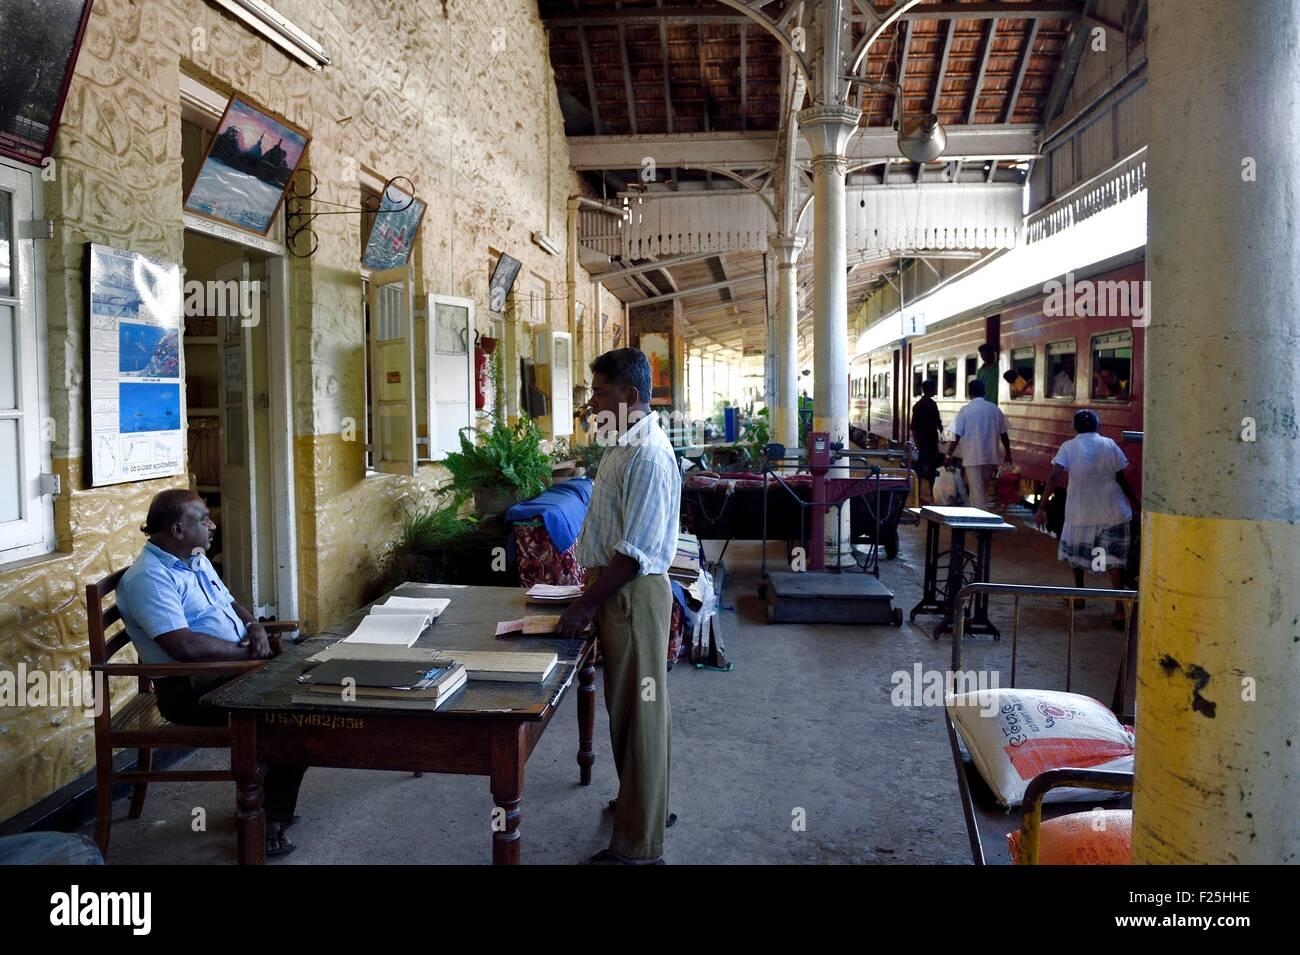 Sri Lanka, Uva Province, Badulla train station - Stock Image